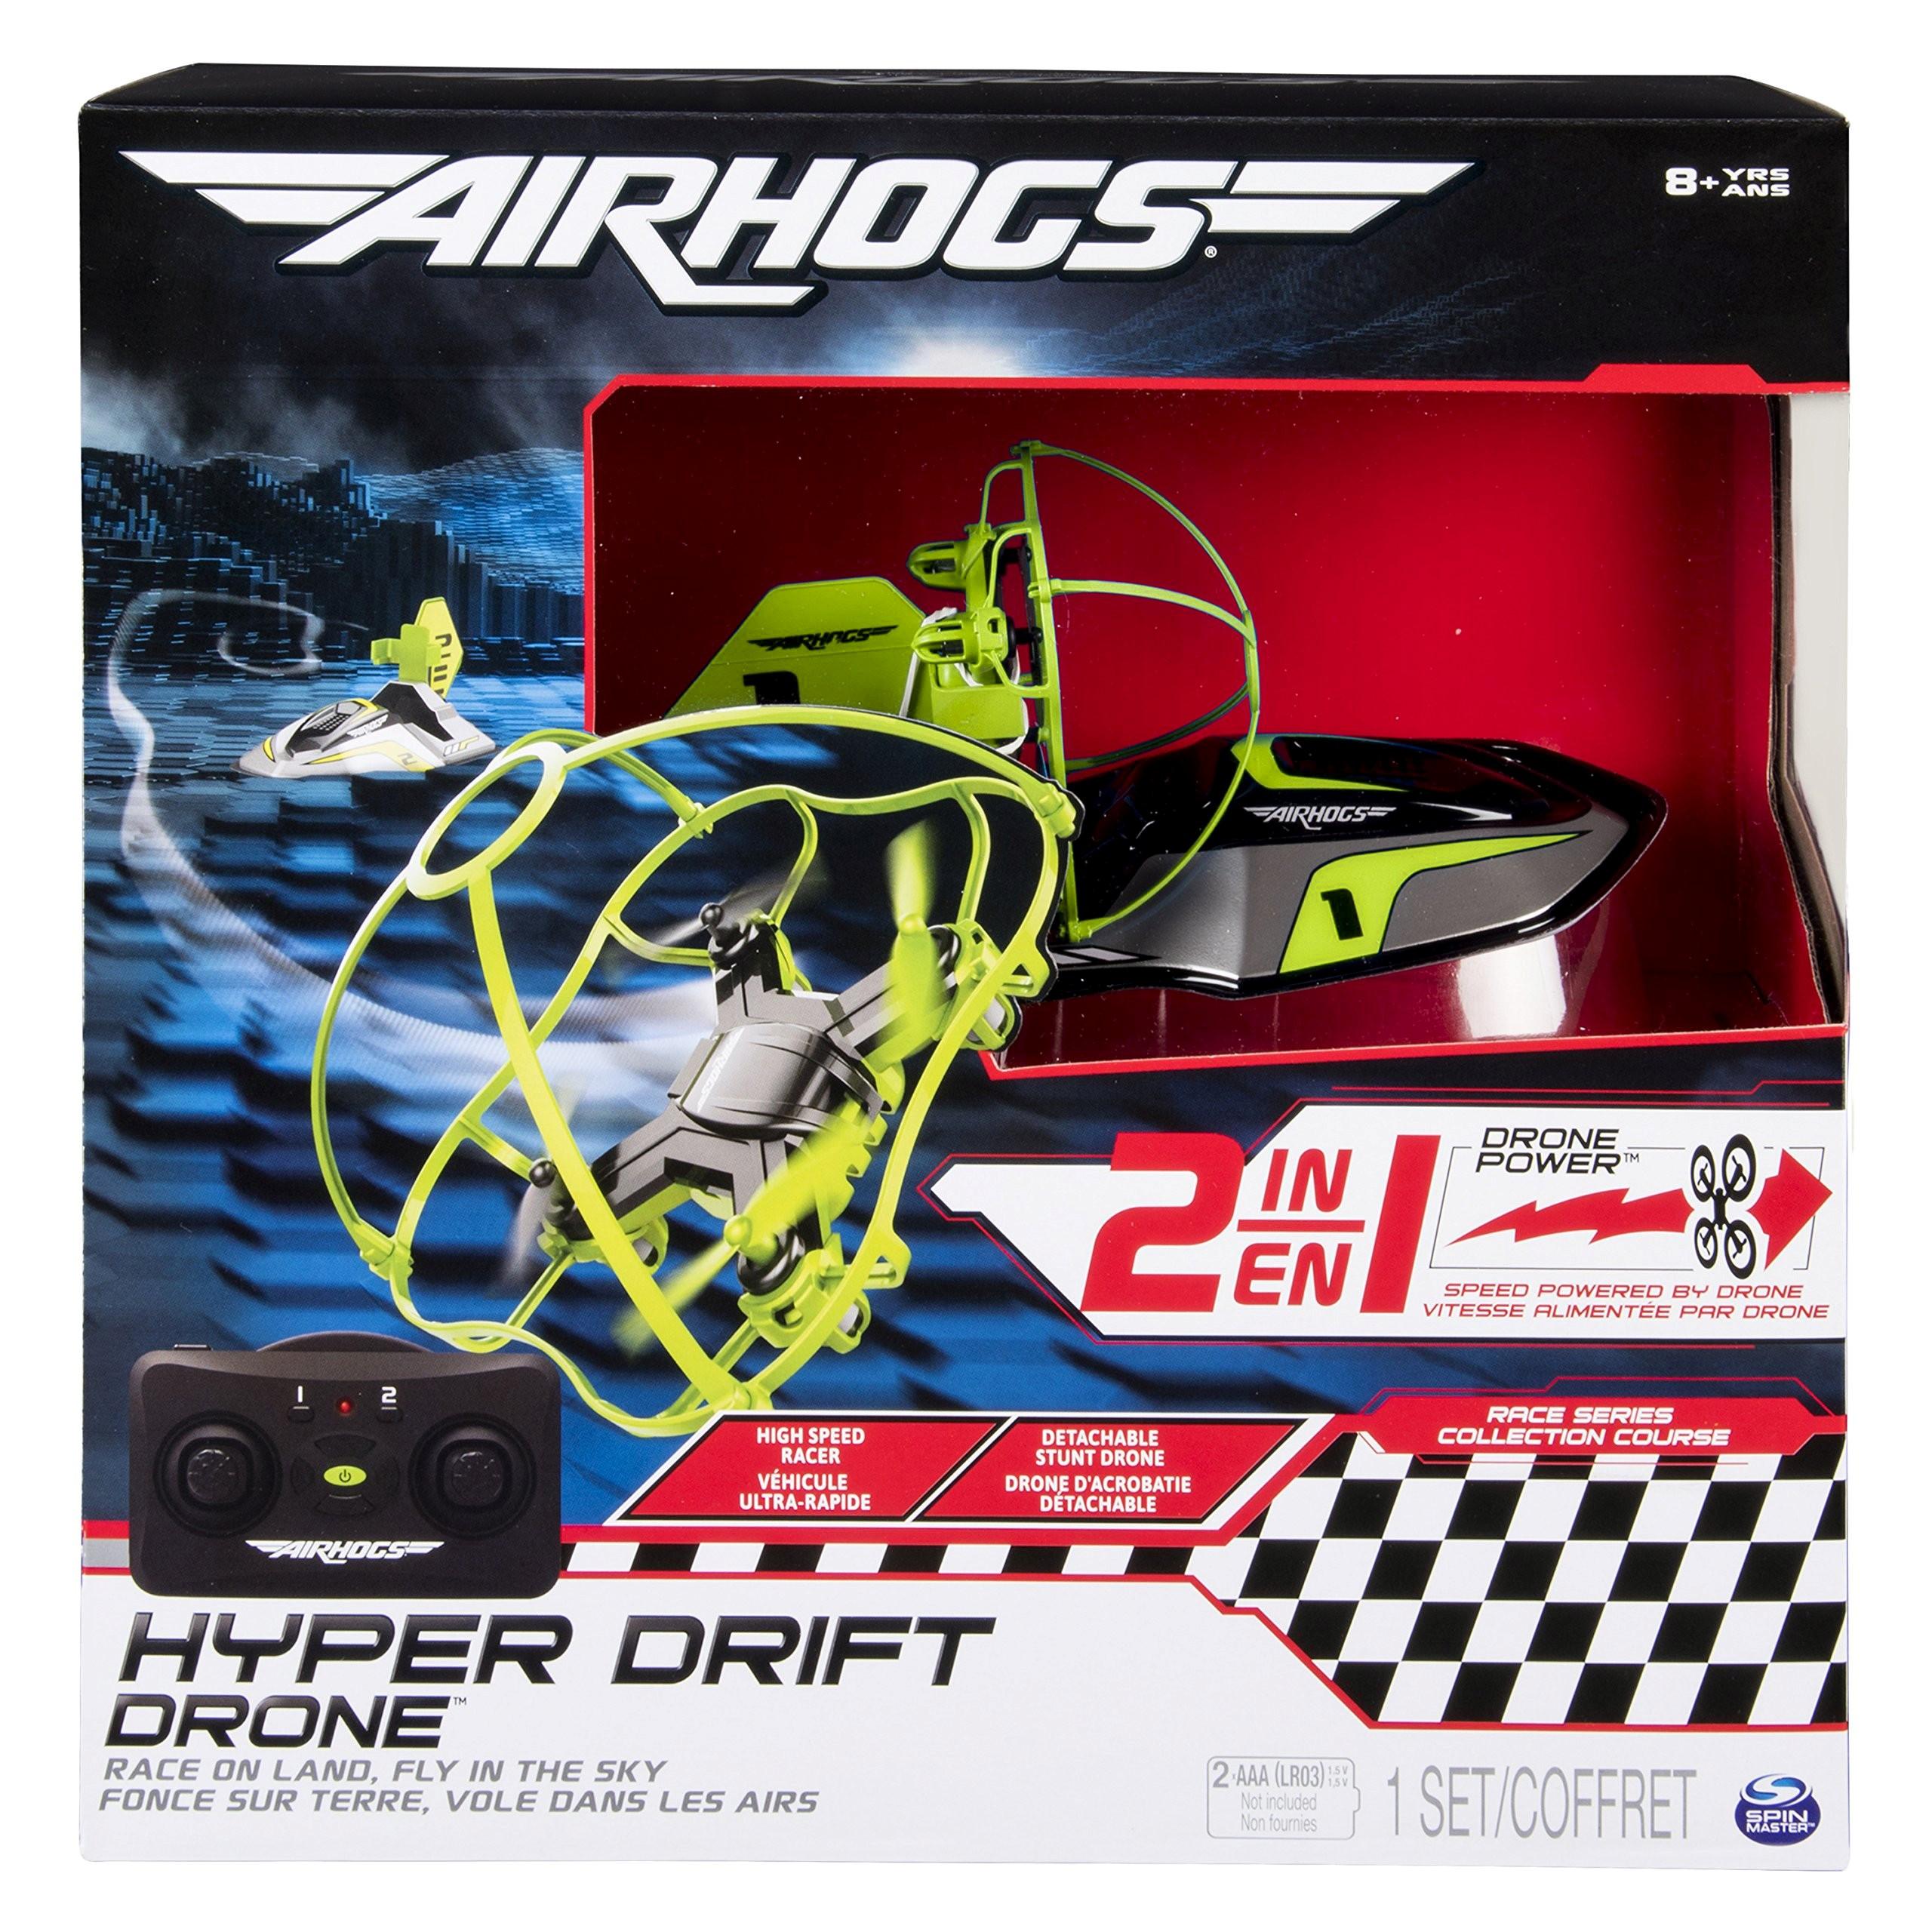 HYPER DRIFT DRONE AIRHOGS